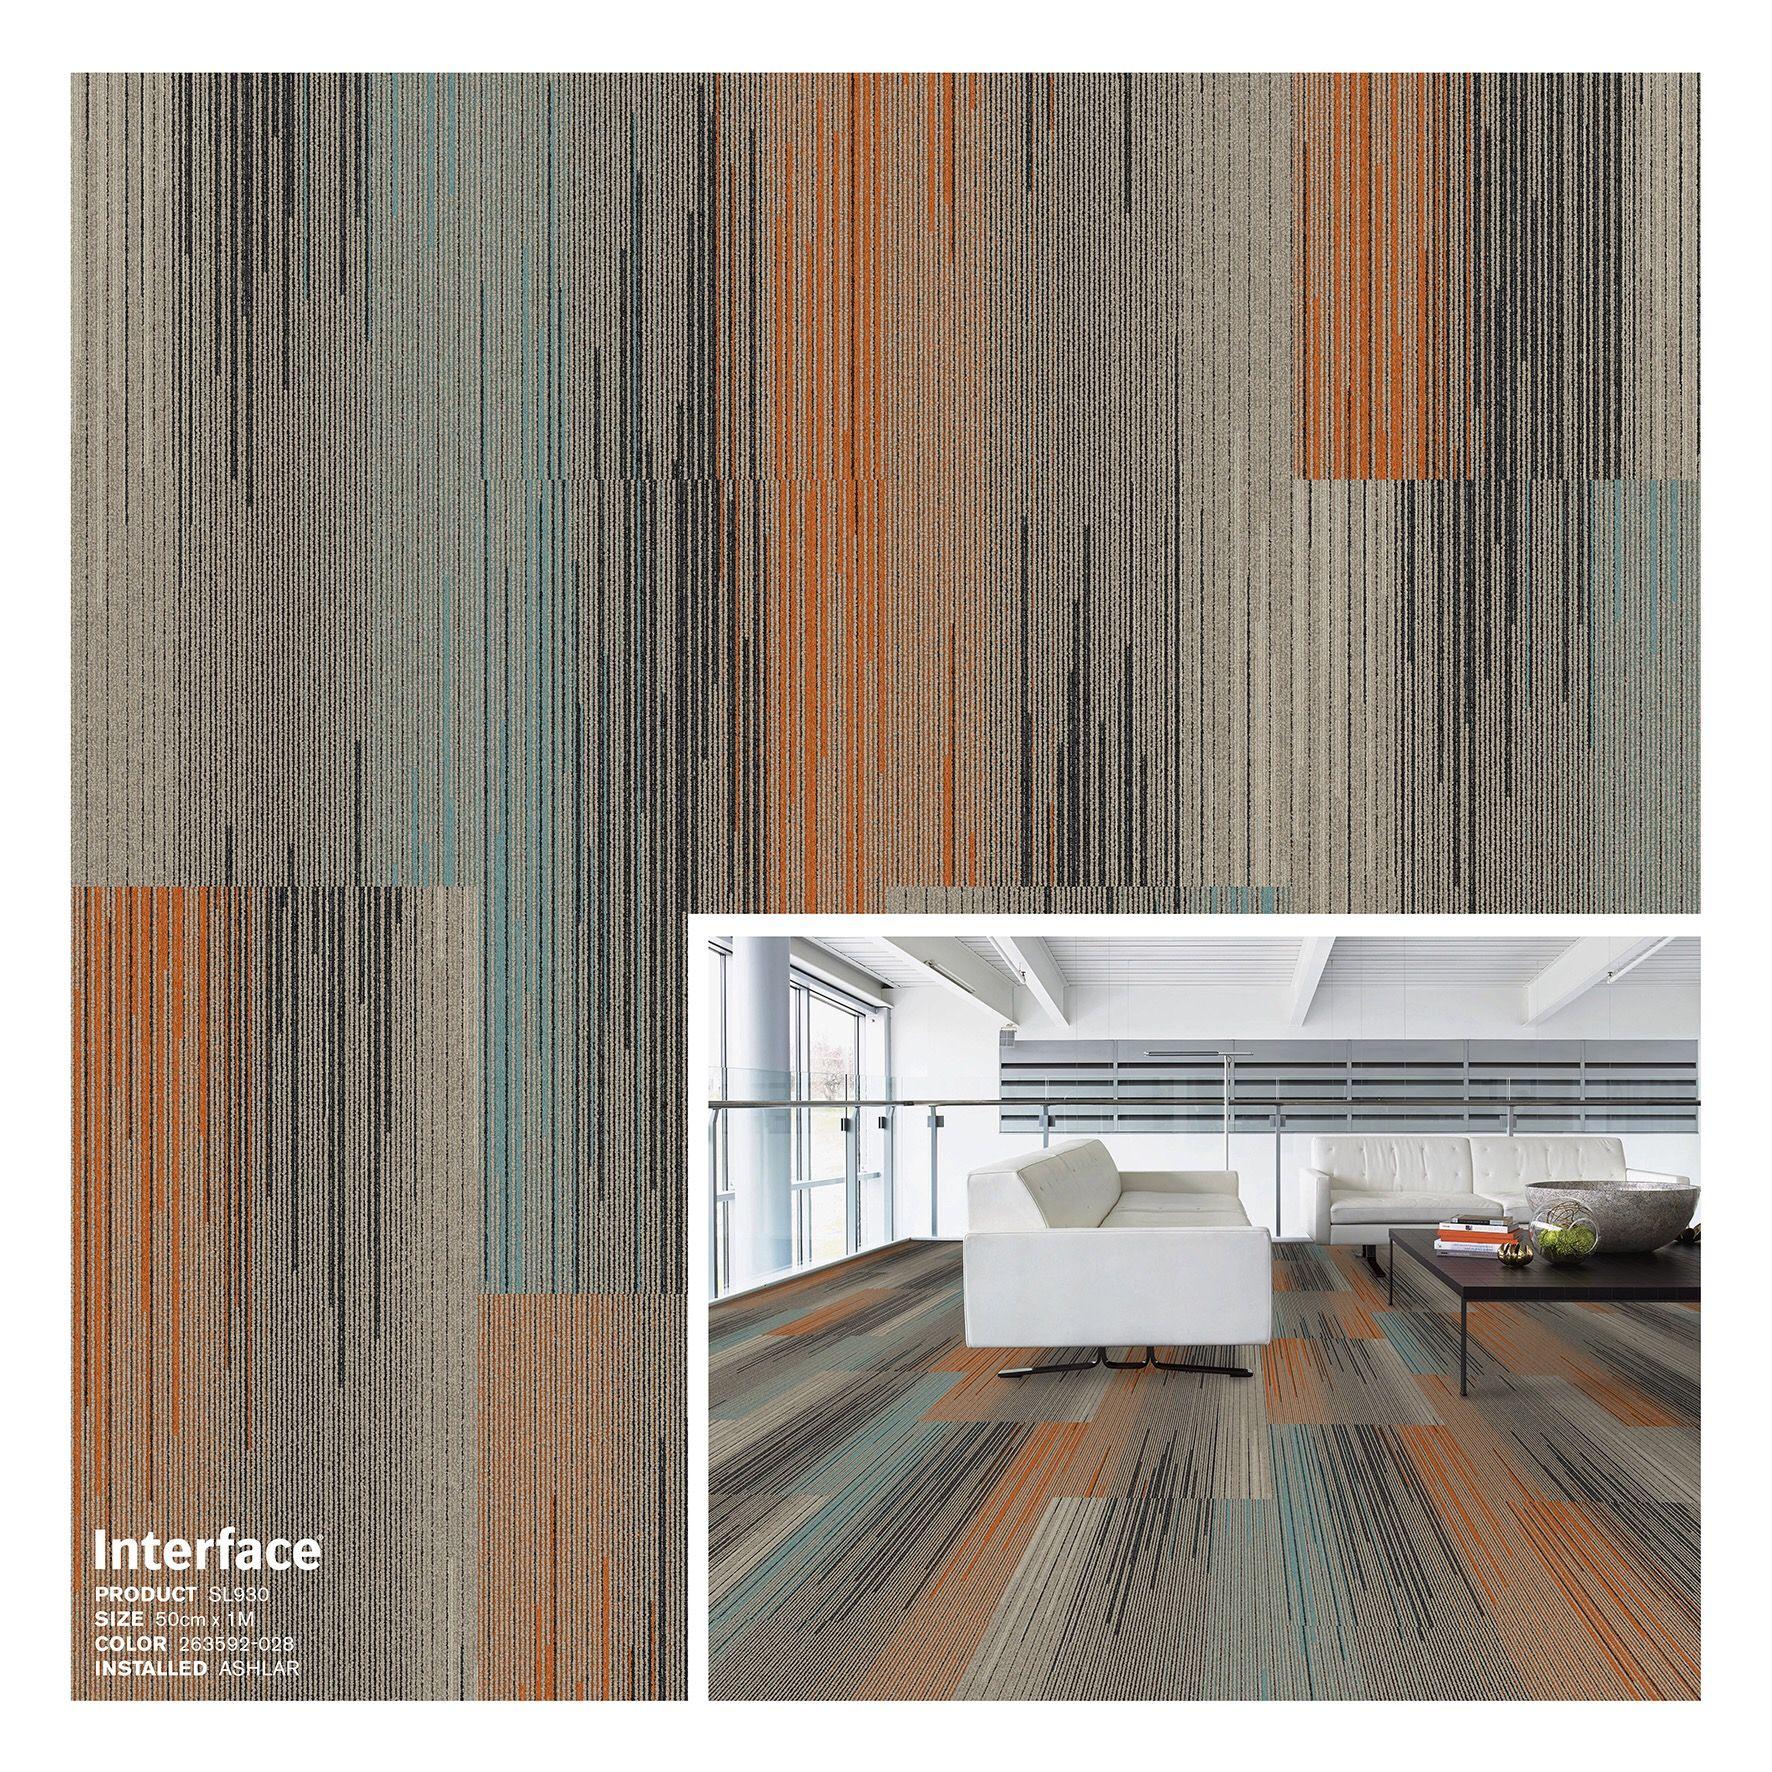 Commercial Flooring Companies Austin Texas: Silver Linings